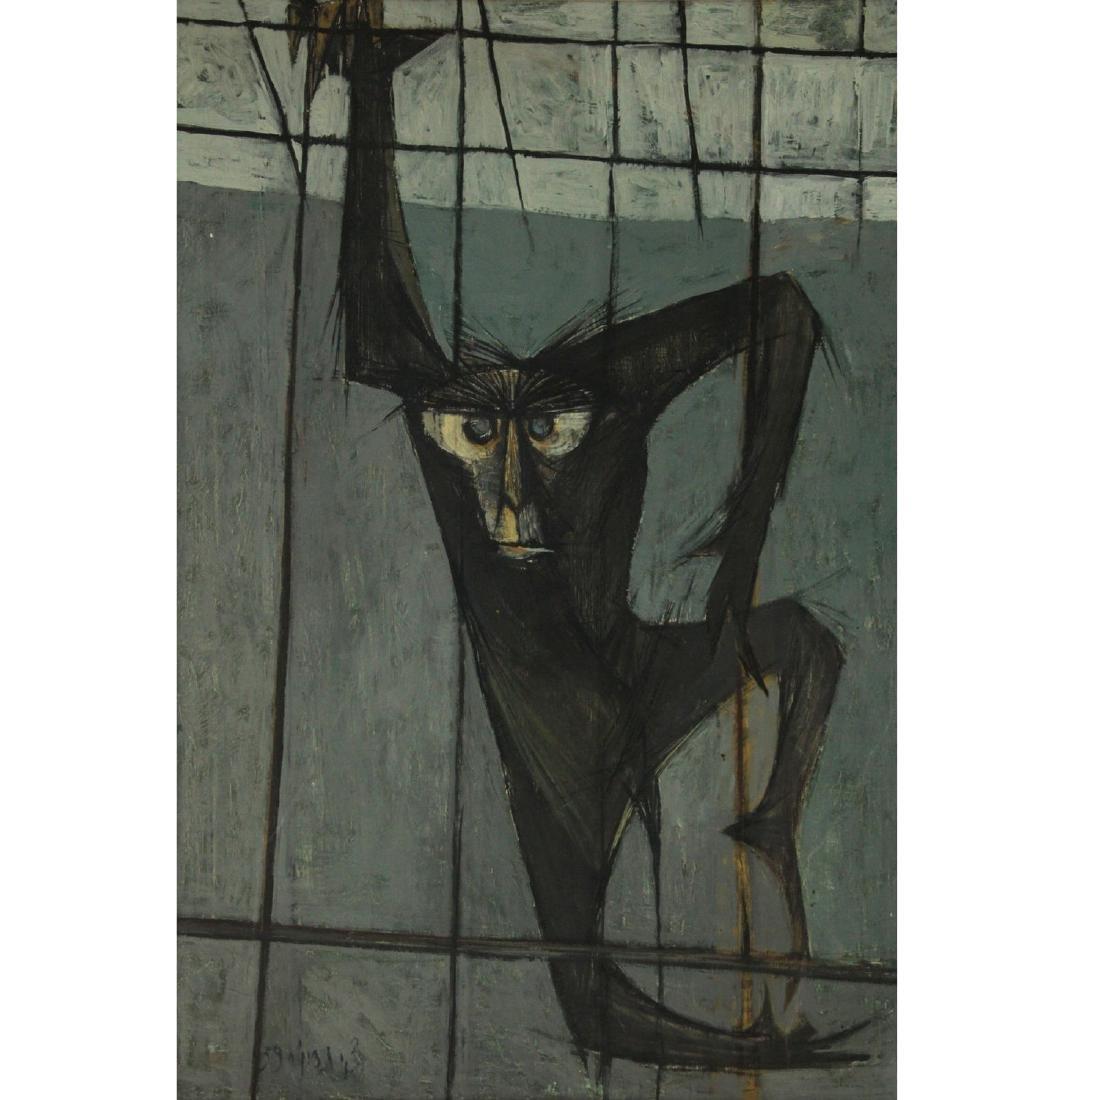 Zvi Tadmor (1923-2012) - Ape, Oil on Canvas, 1959.